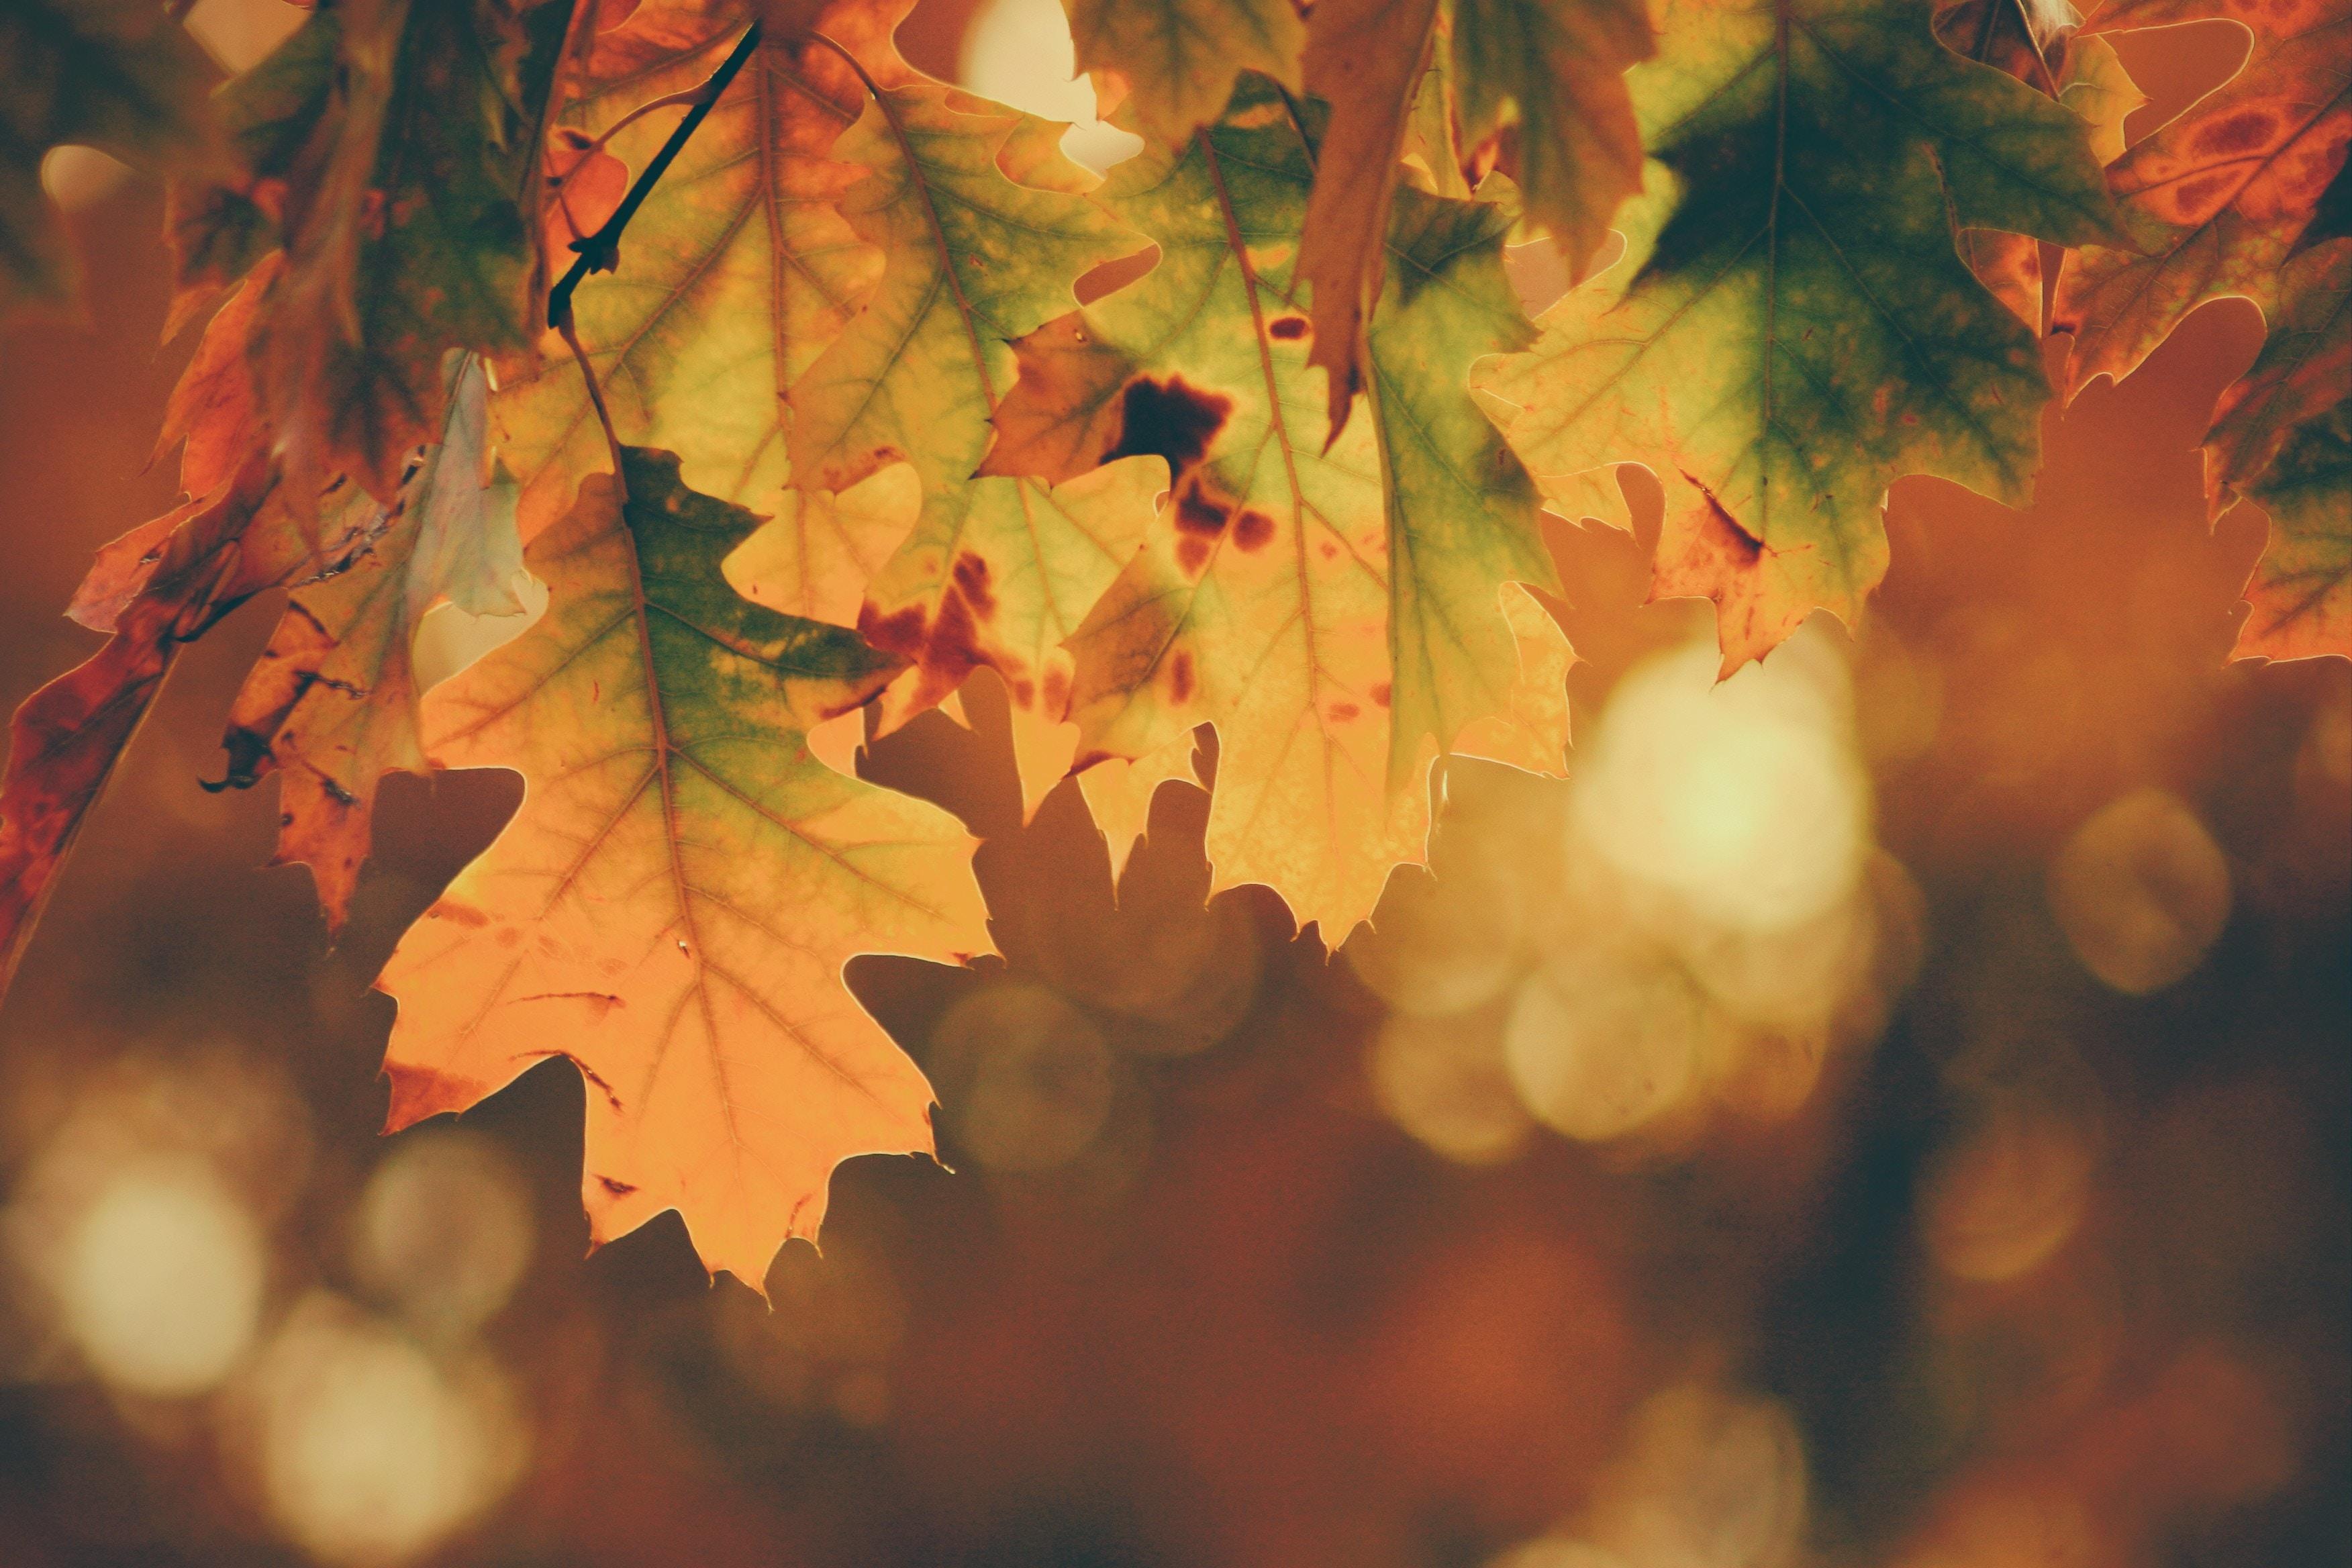 Register for a Fall Quarter German language course now!